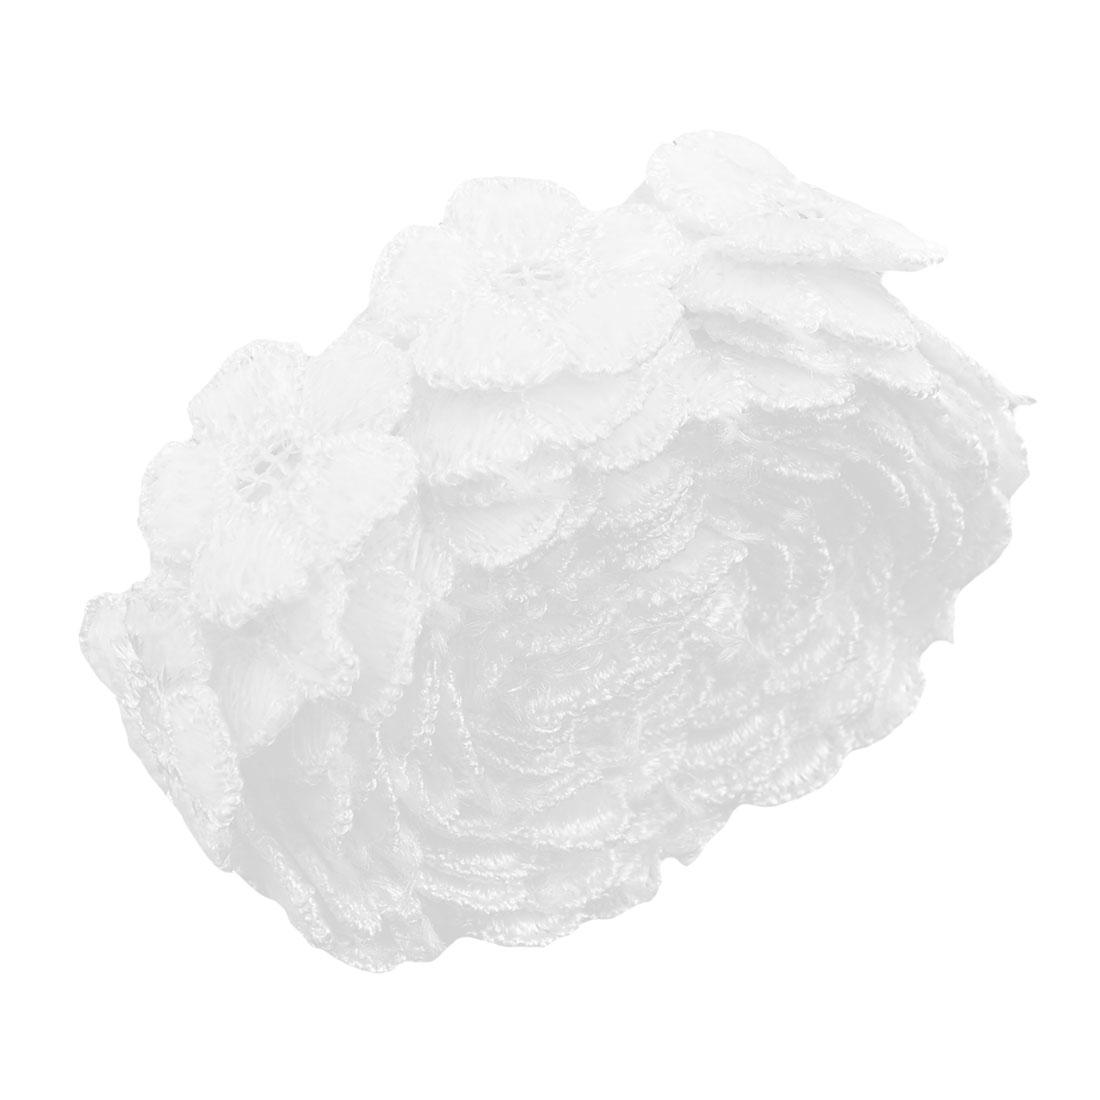 Polyester Floral Design DIY Wedding Dress Decor Embroidery Lace Trim Applique White